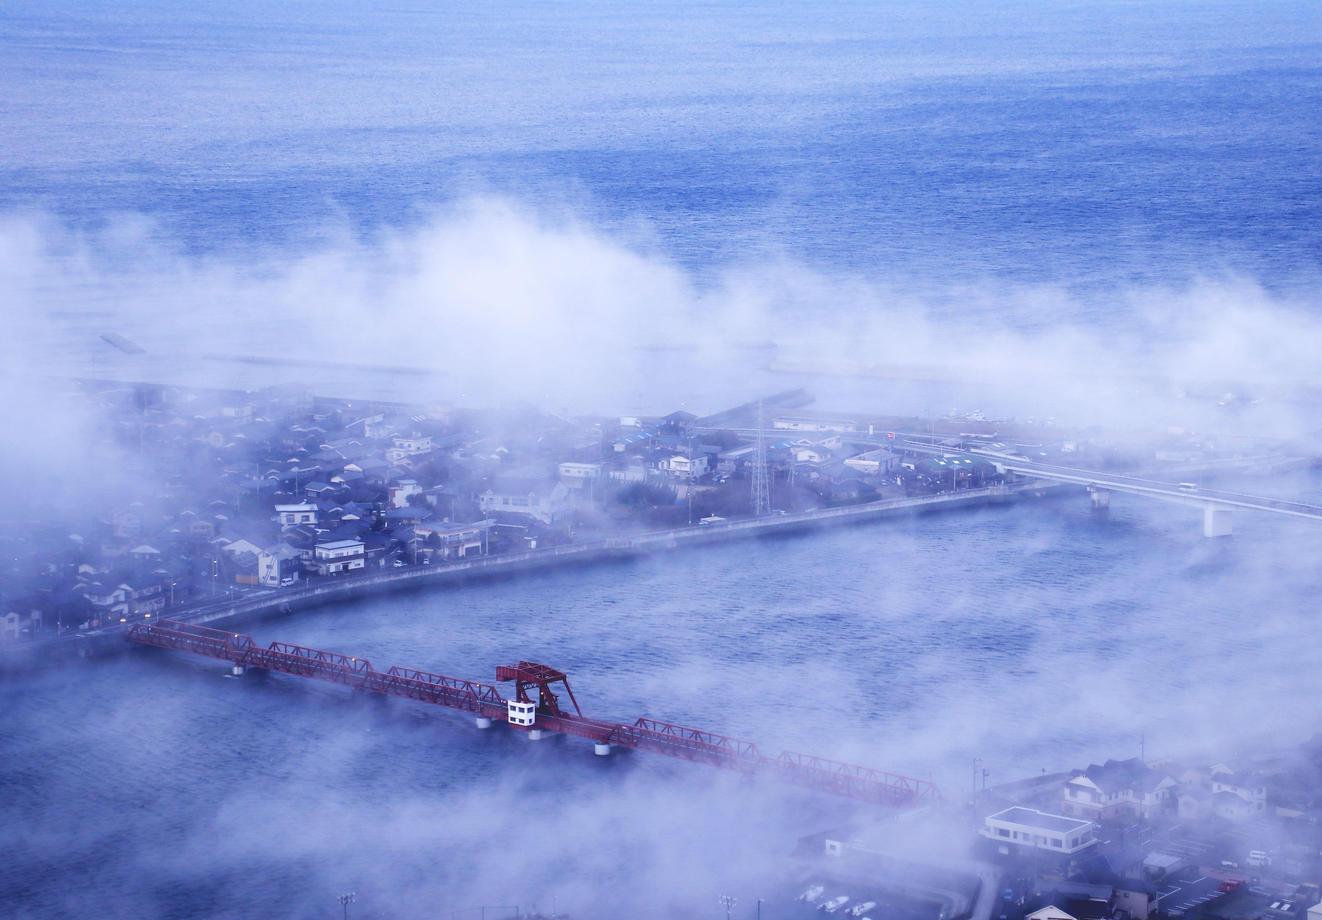 http://fujiwara-nh.or.jp/archives/167562c8330856f945b2c860daeae04a79b67cb6.jpg